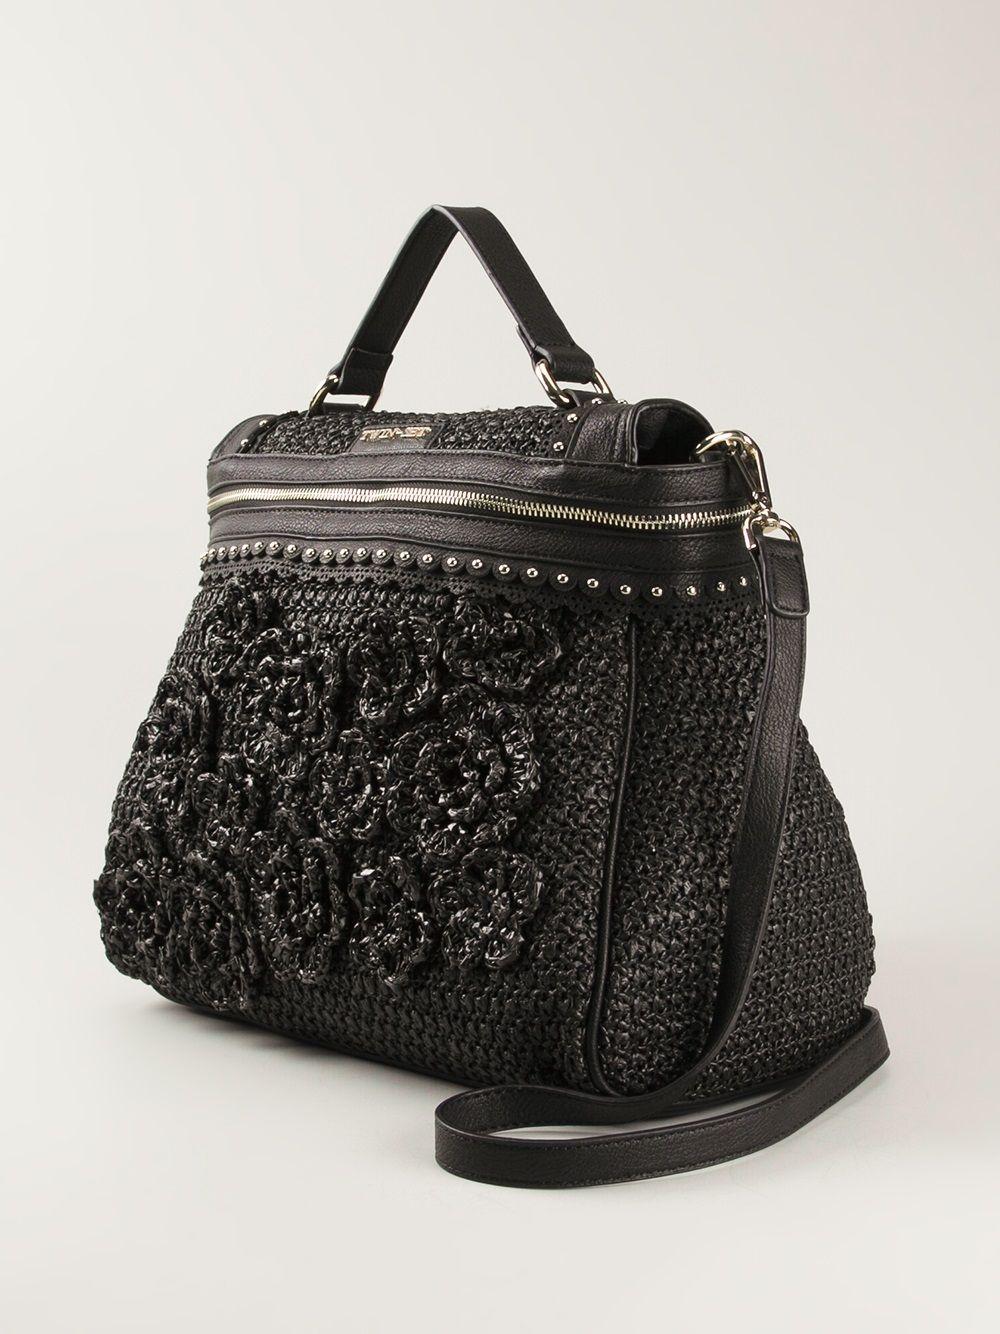 Twin Set Simona Barbieri Fl Crochet Tote Bag